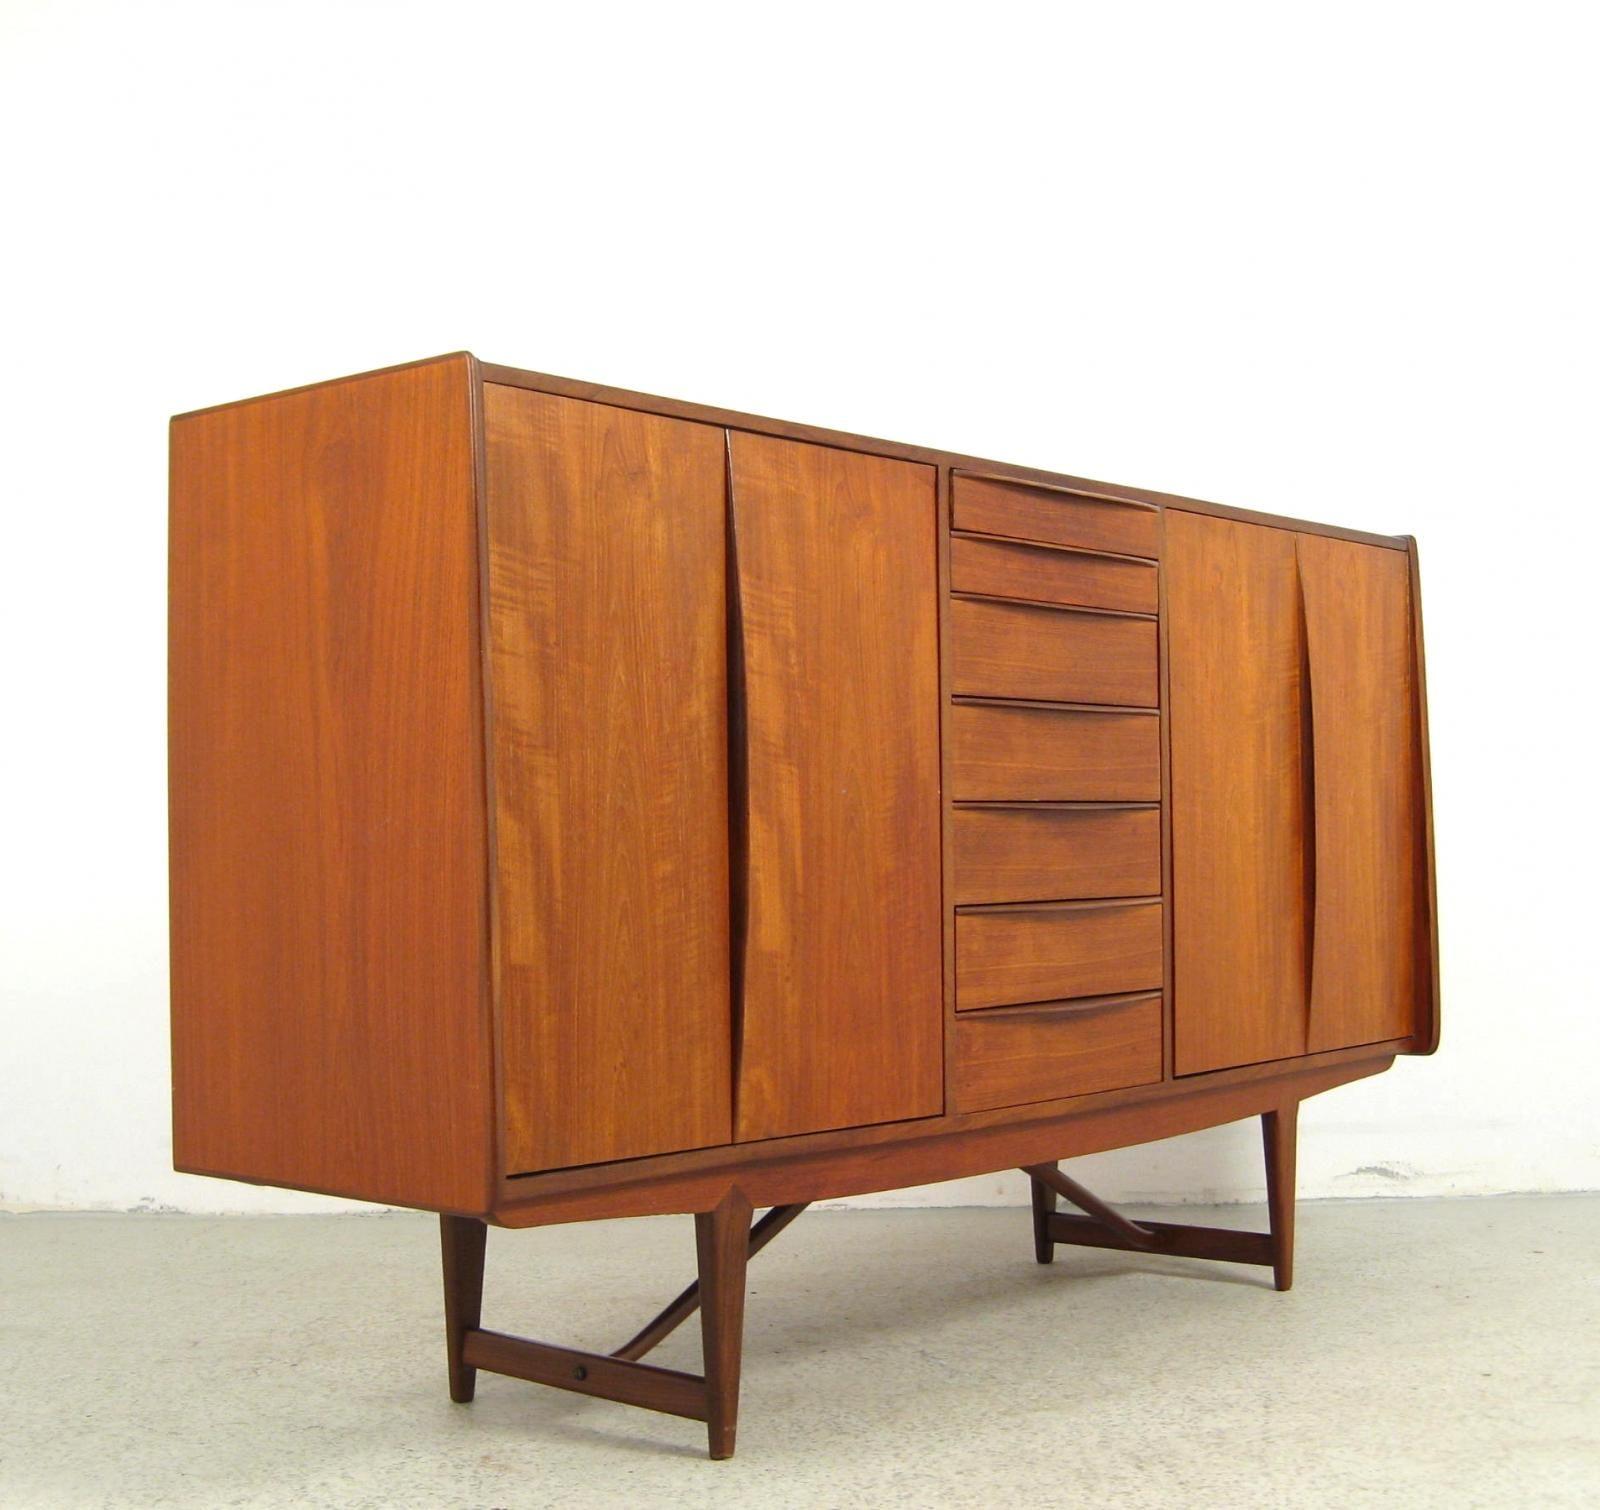 areaneo teakwood 60s highboard denmark 1960 lauritz. Black Bedroom Furniture Sets. Home Design Ideas